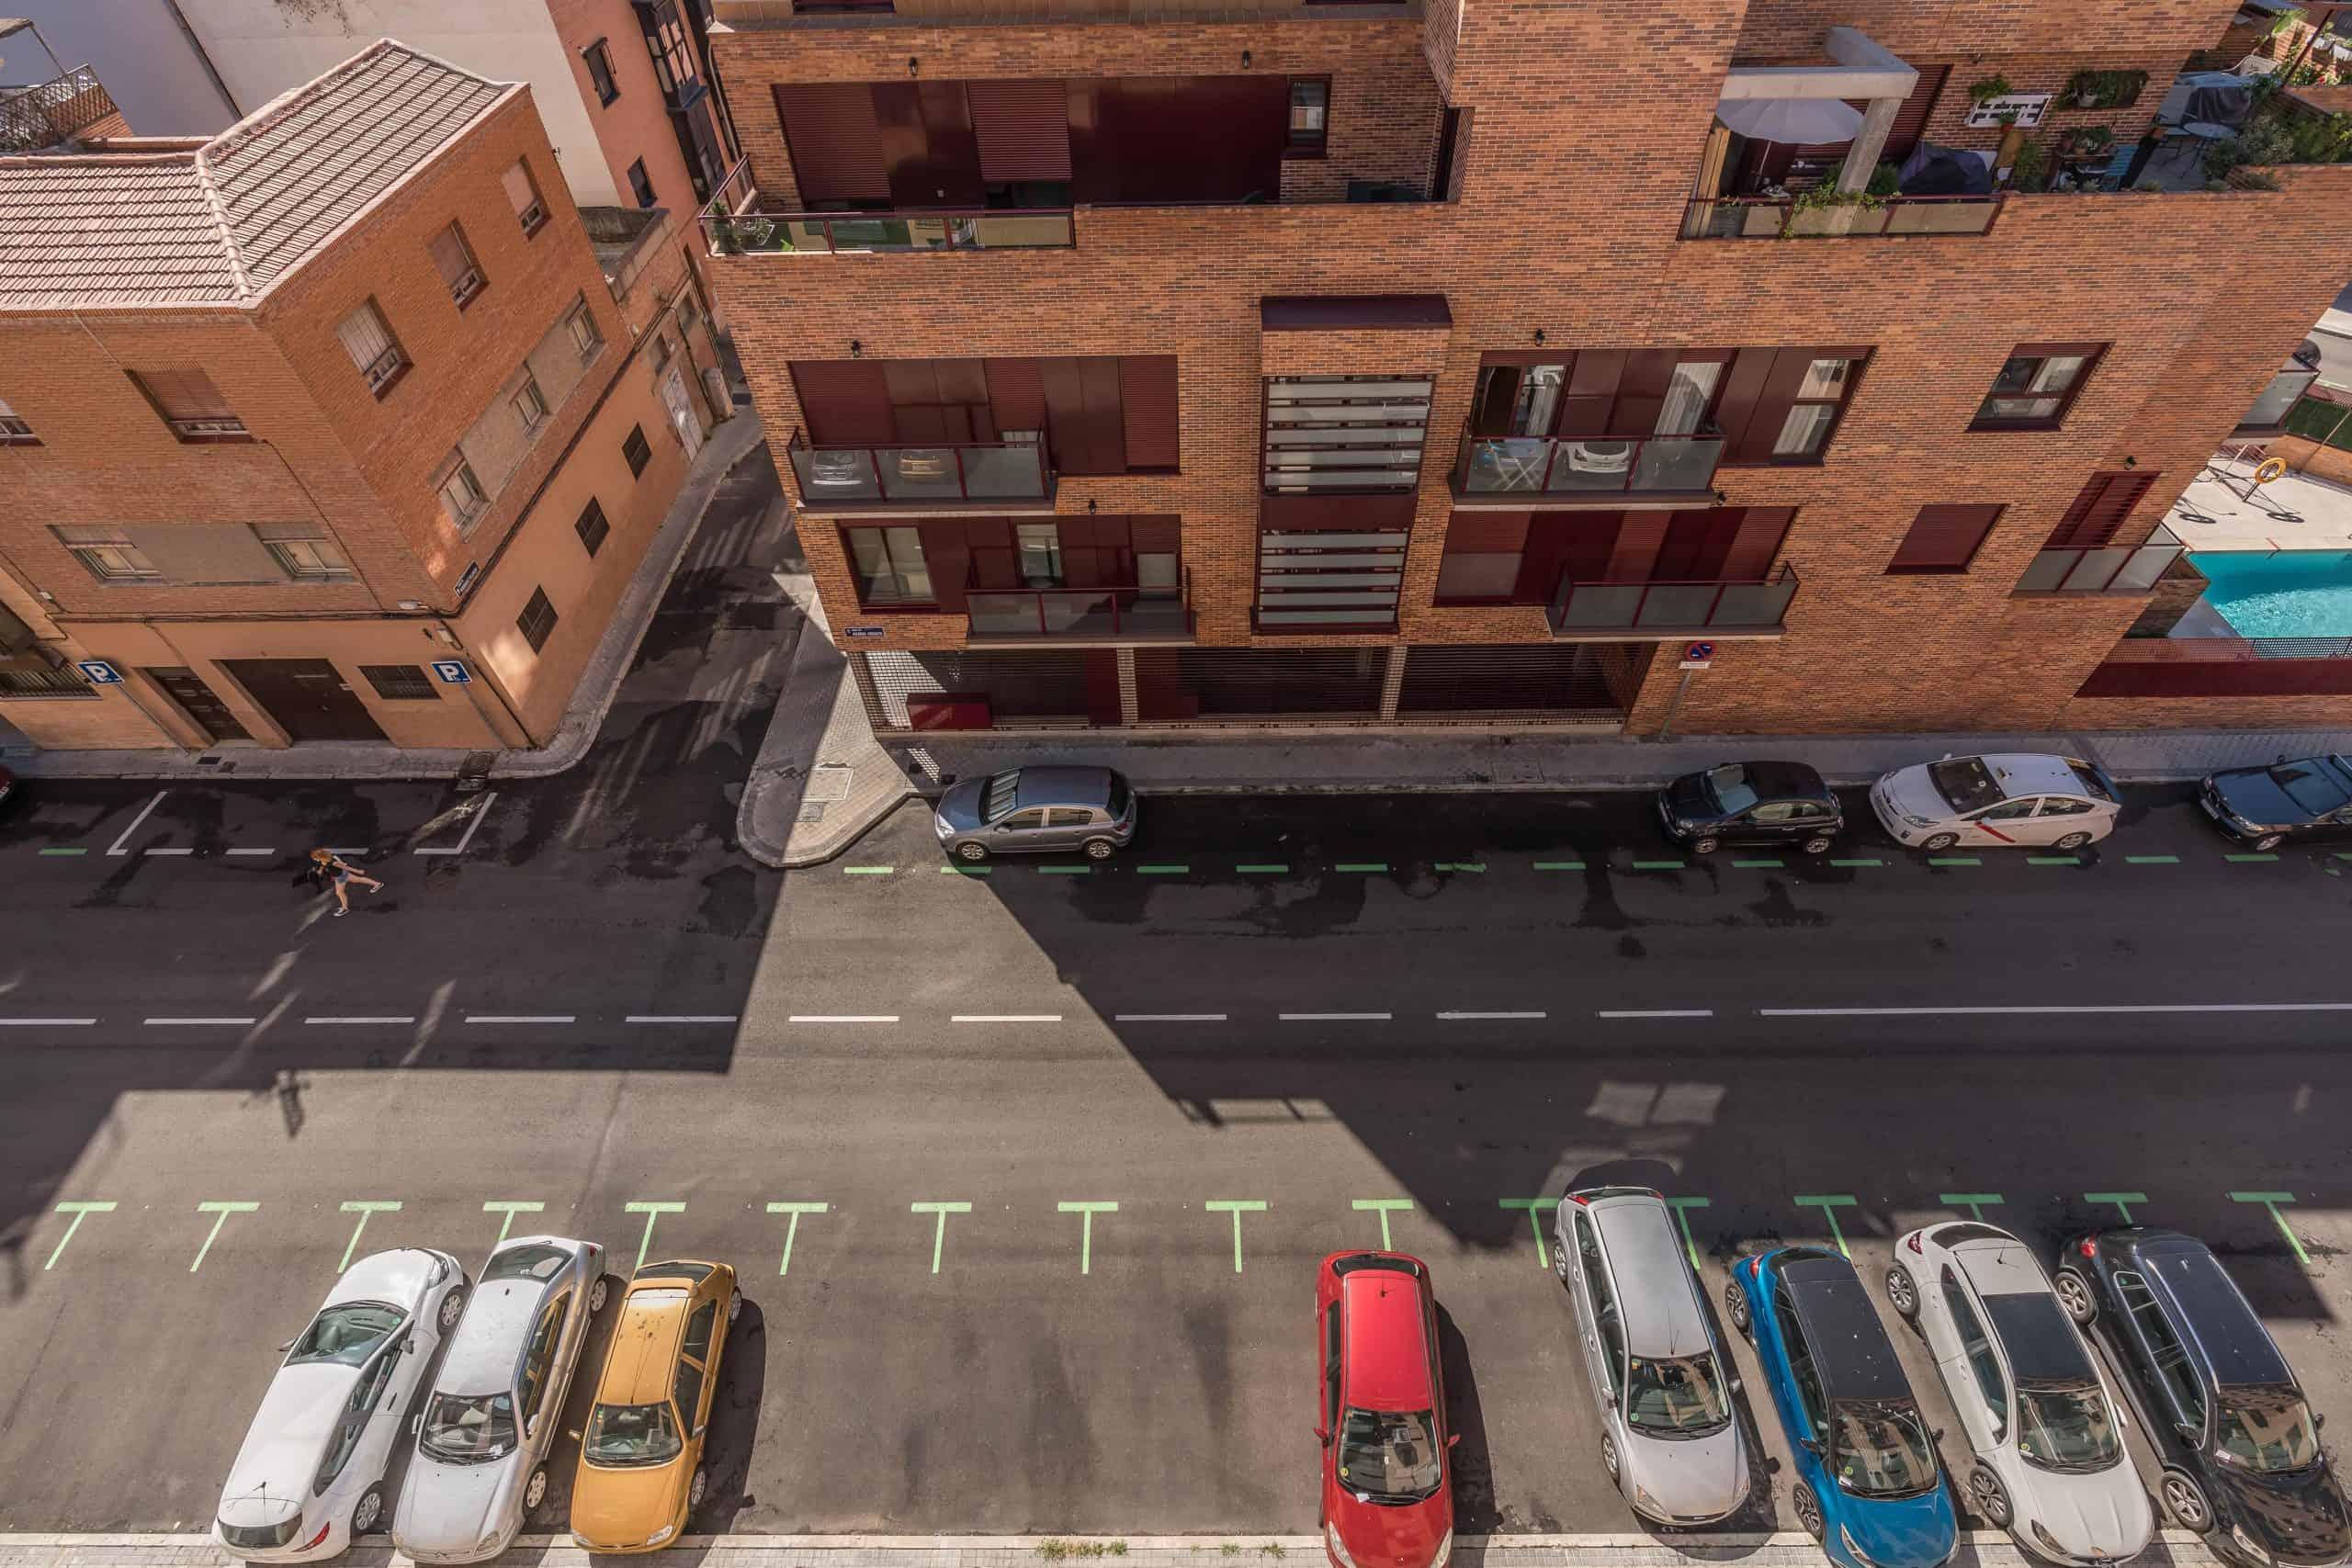 Agencia Inmobiliaria de Madrid-FUTUROCASA-Zona ARGANZUELA-EMBAJADORES-LEGAZPI13 VISTAS (3)